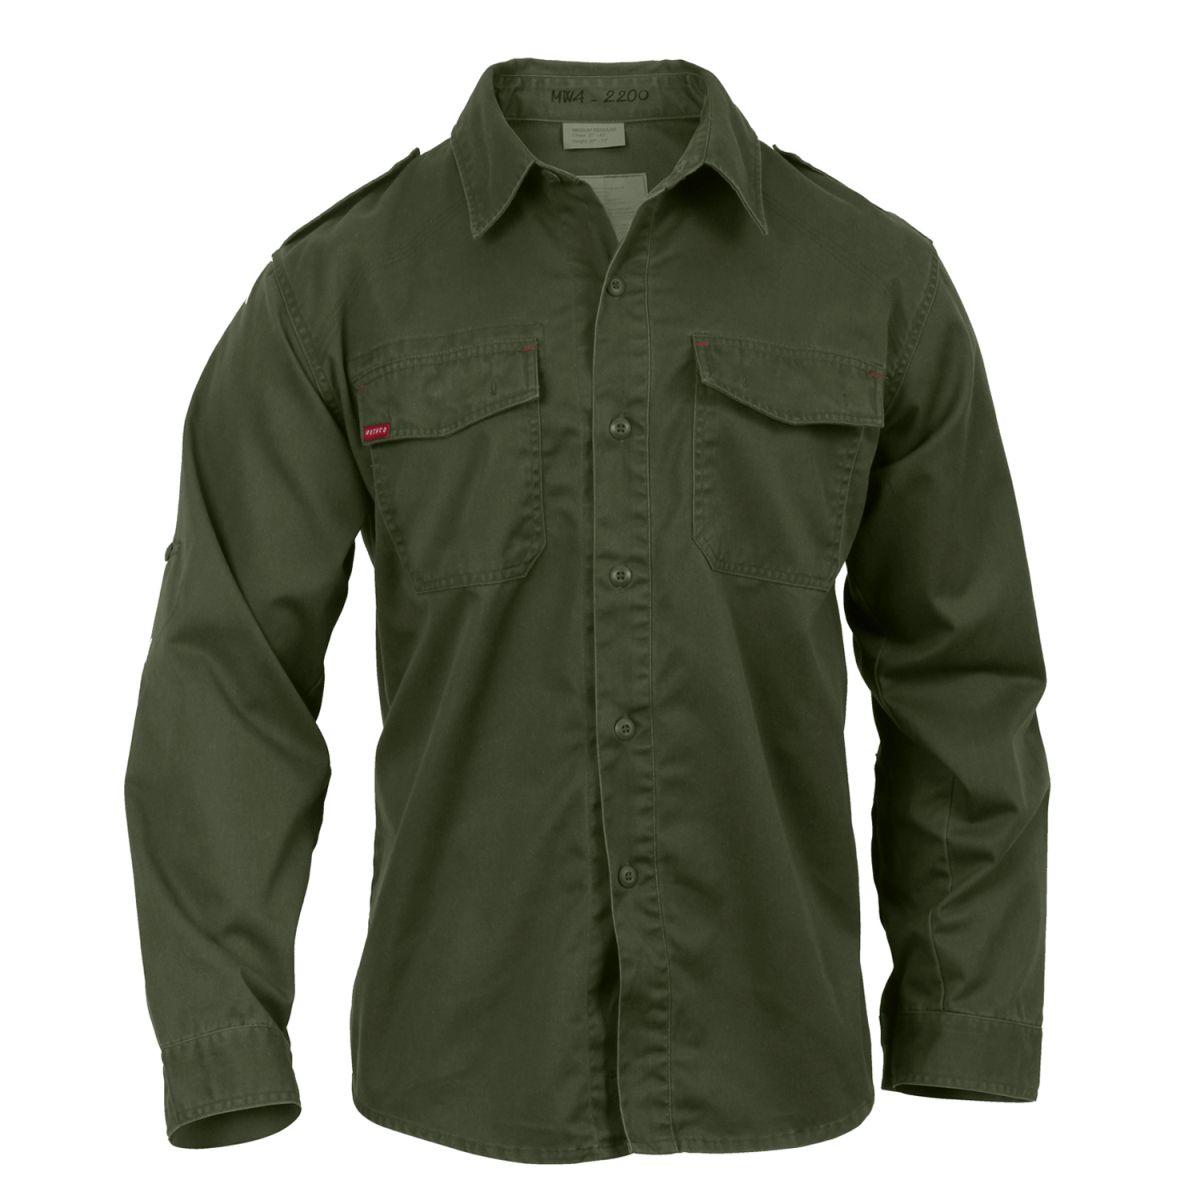 Košile VINTAGE FATIGUE  ZELENÁ ROTHCO 2568 L-11